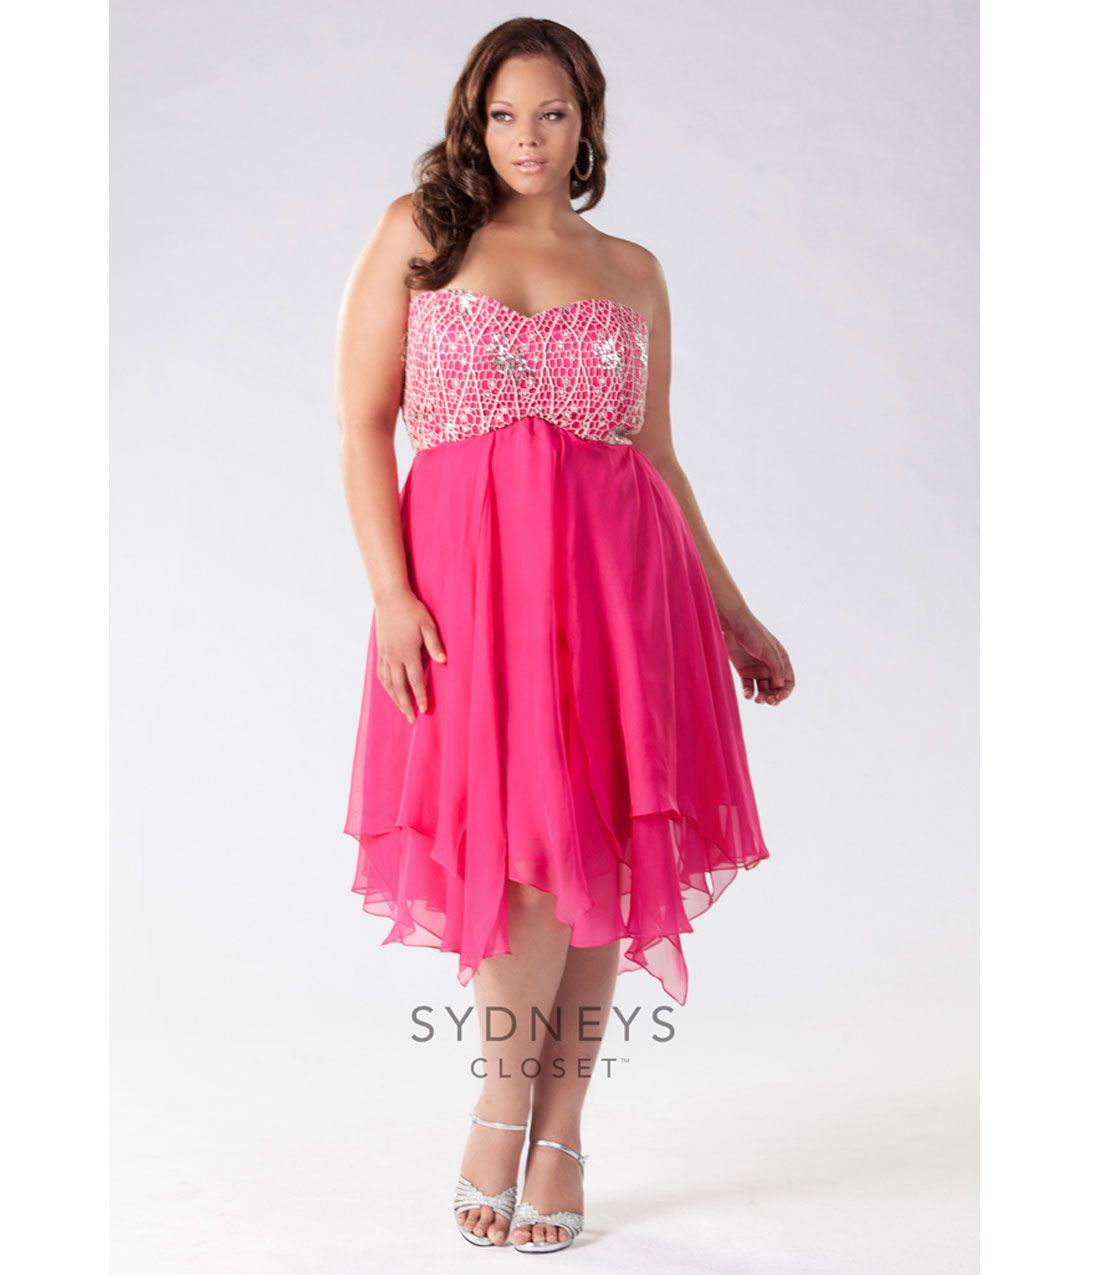 168 Stop Staring! 1930s Style Navy & Ivory Railene Dress | Lace ...